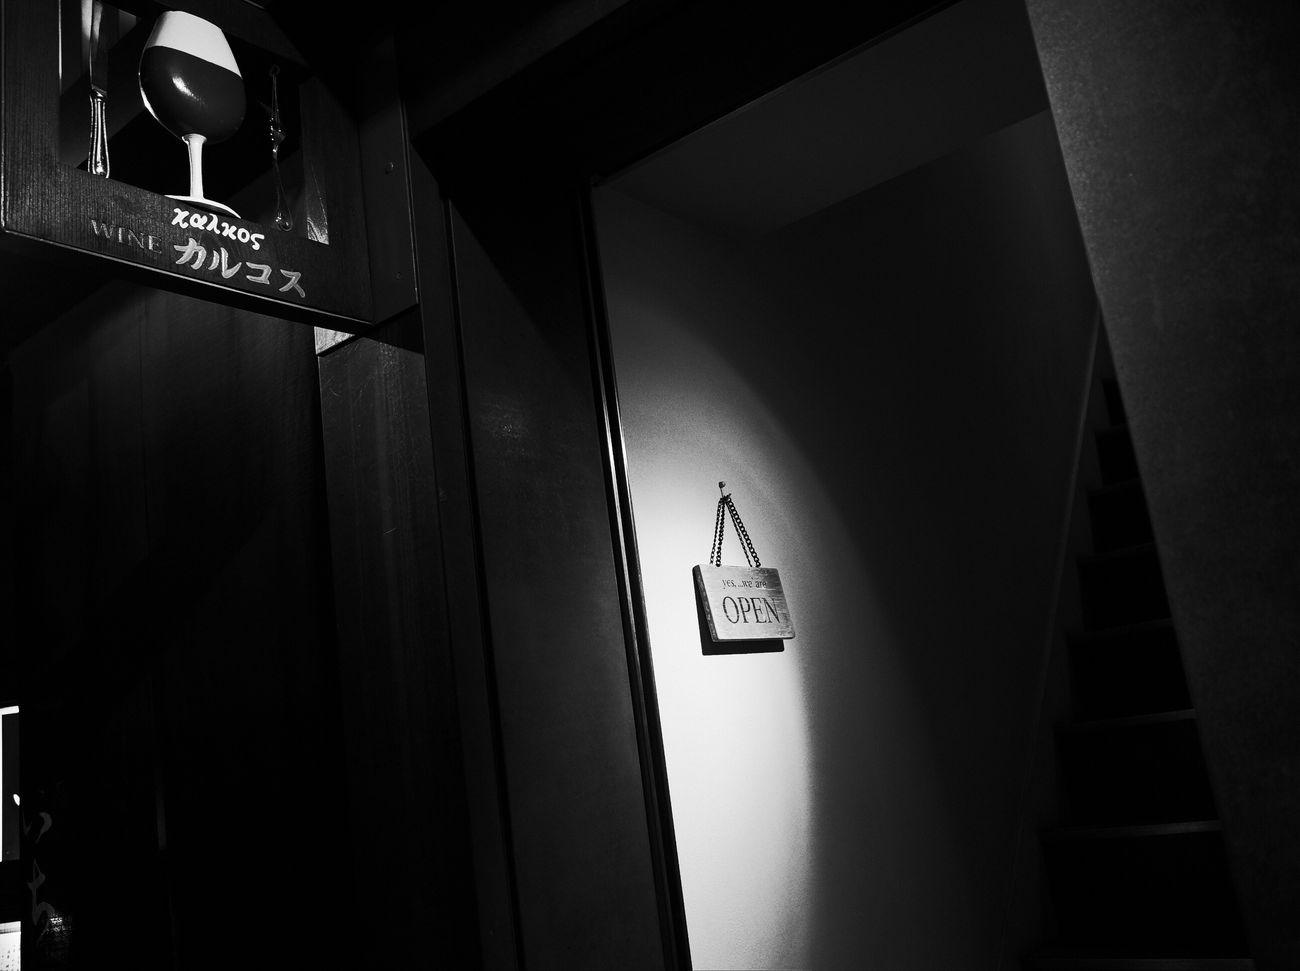 Bar Streetphoto_bw Black And White Snapshots Of Life City Life Night Creative Light And Shadow Travel Osaka,Japan